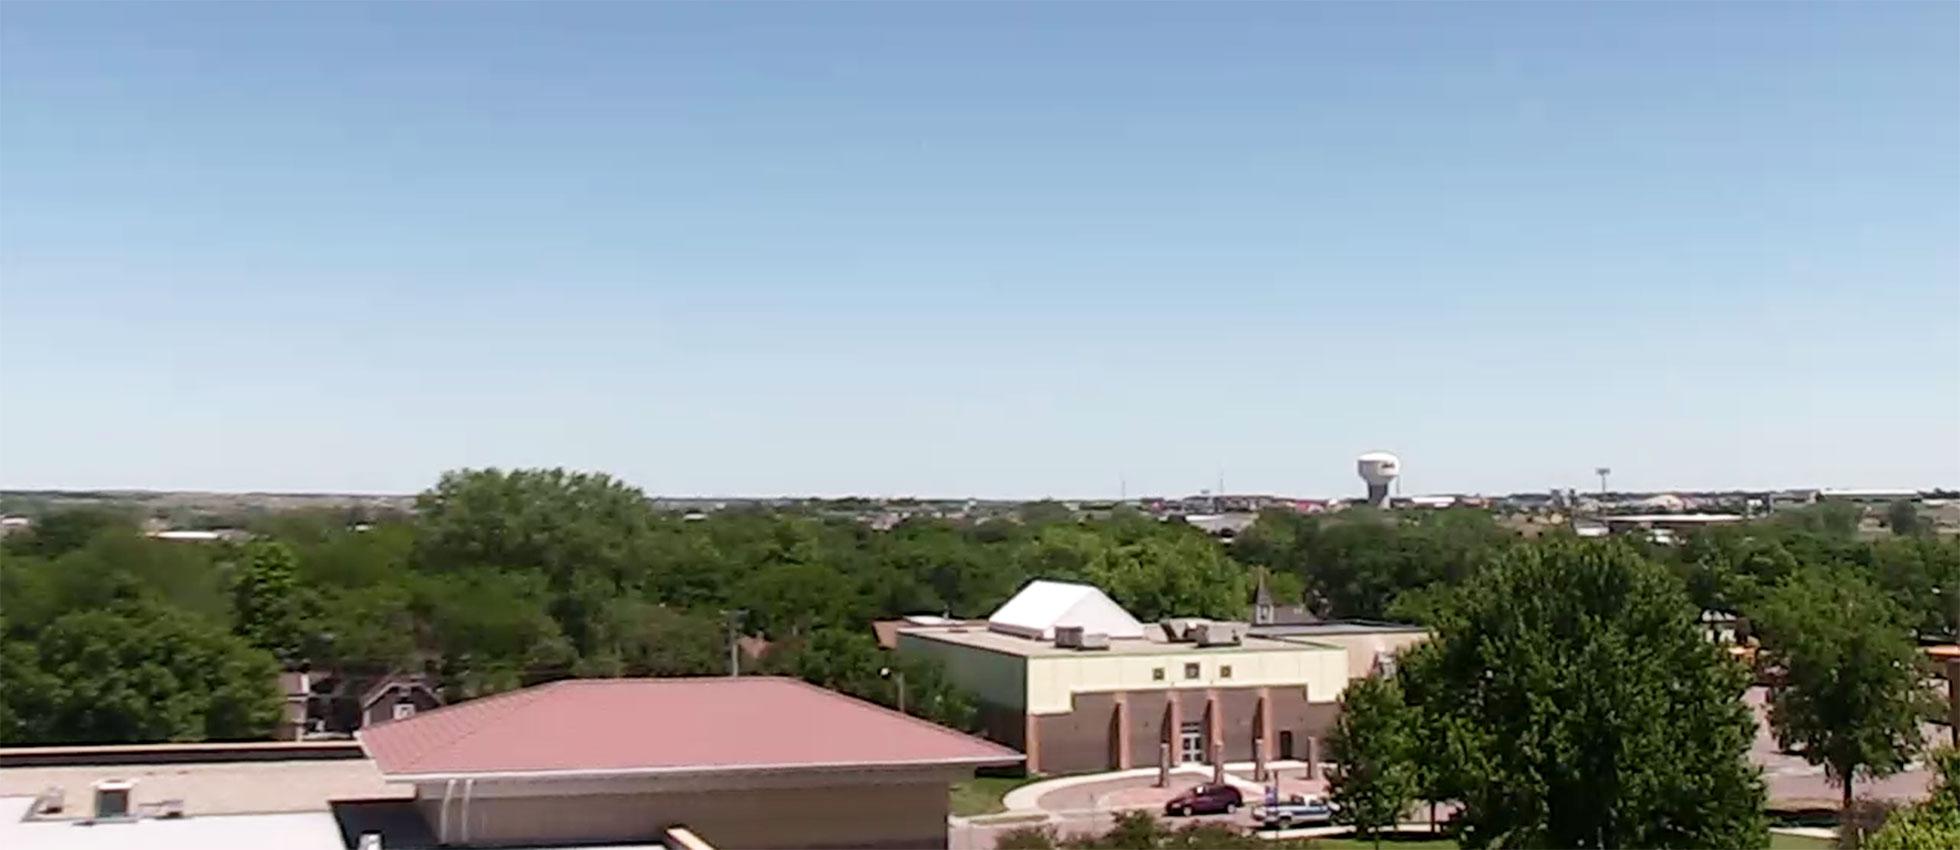 Mitchell South Dakota skycam